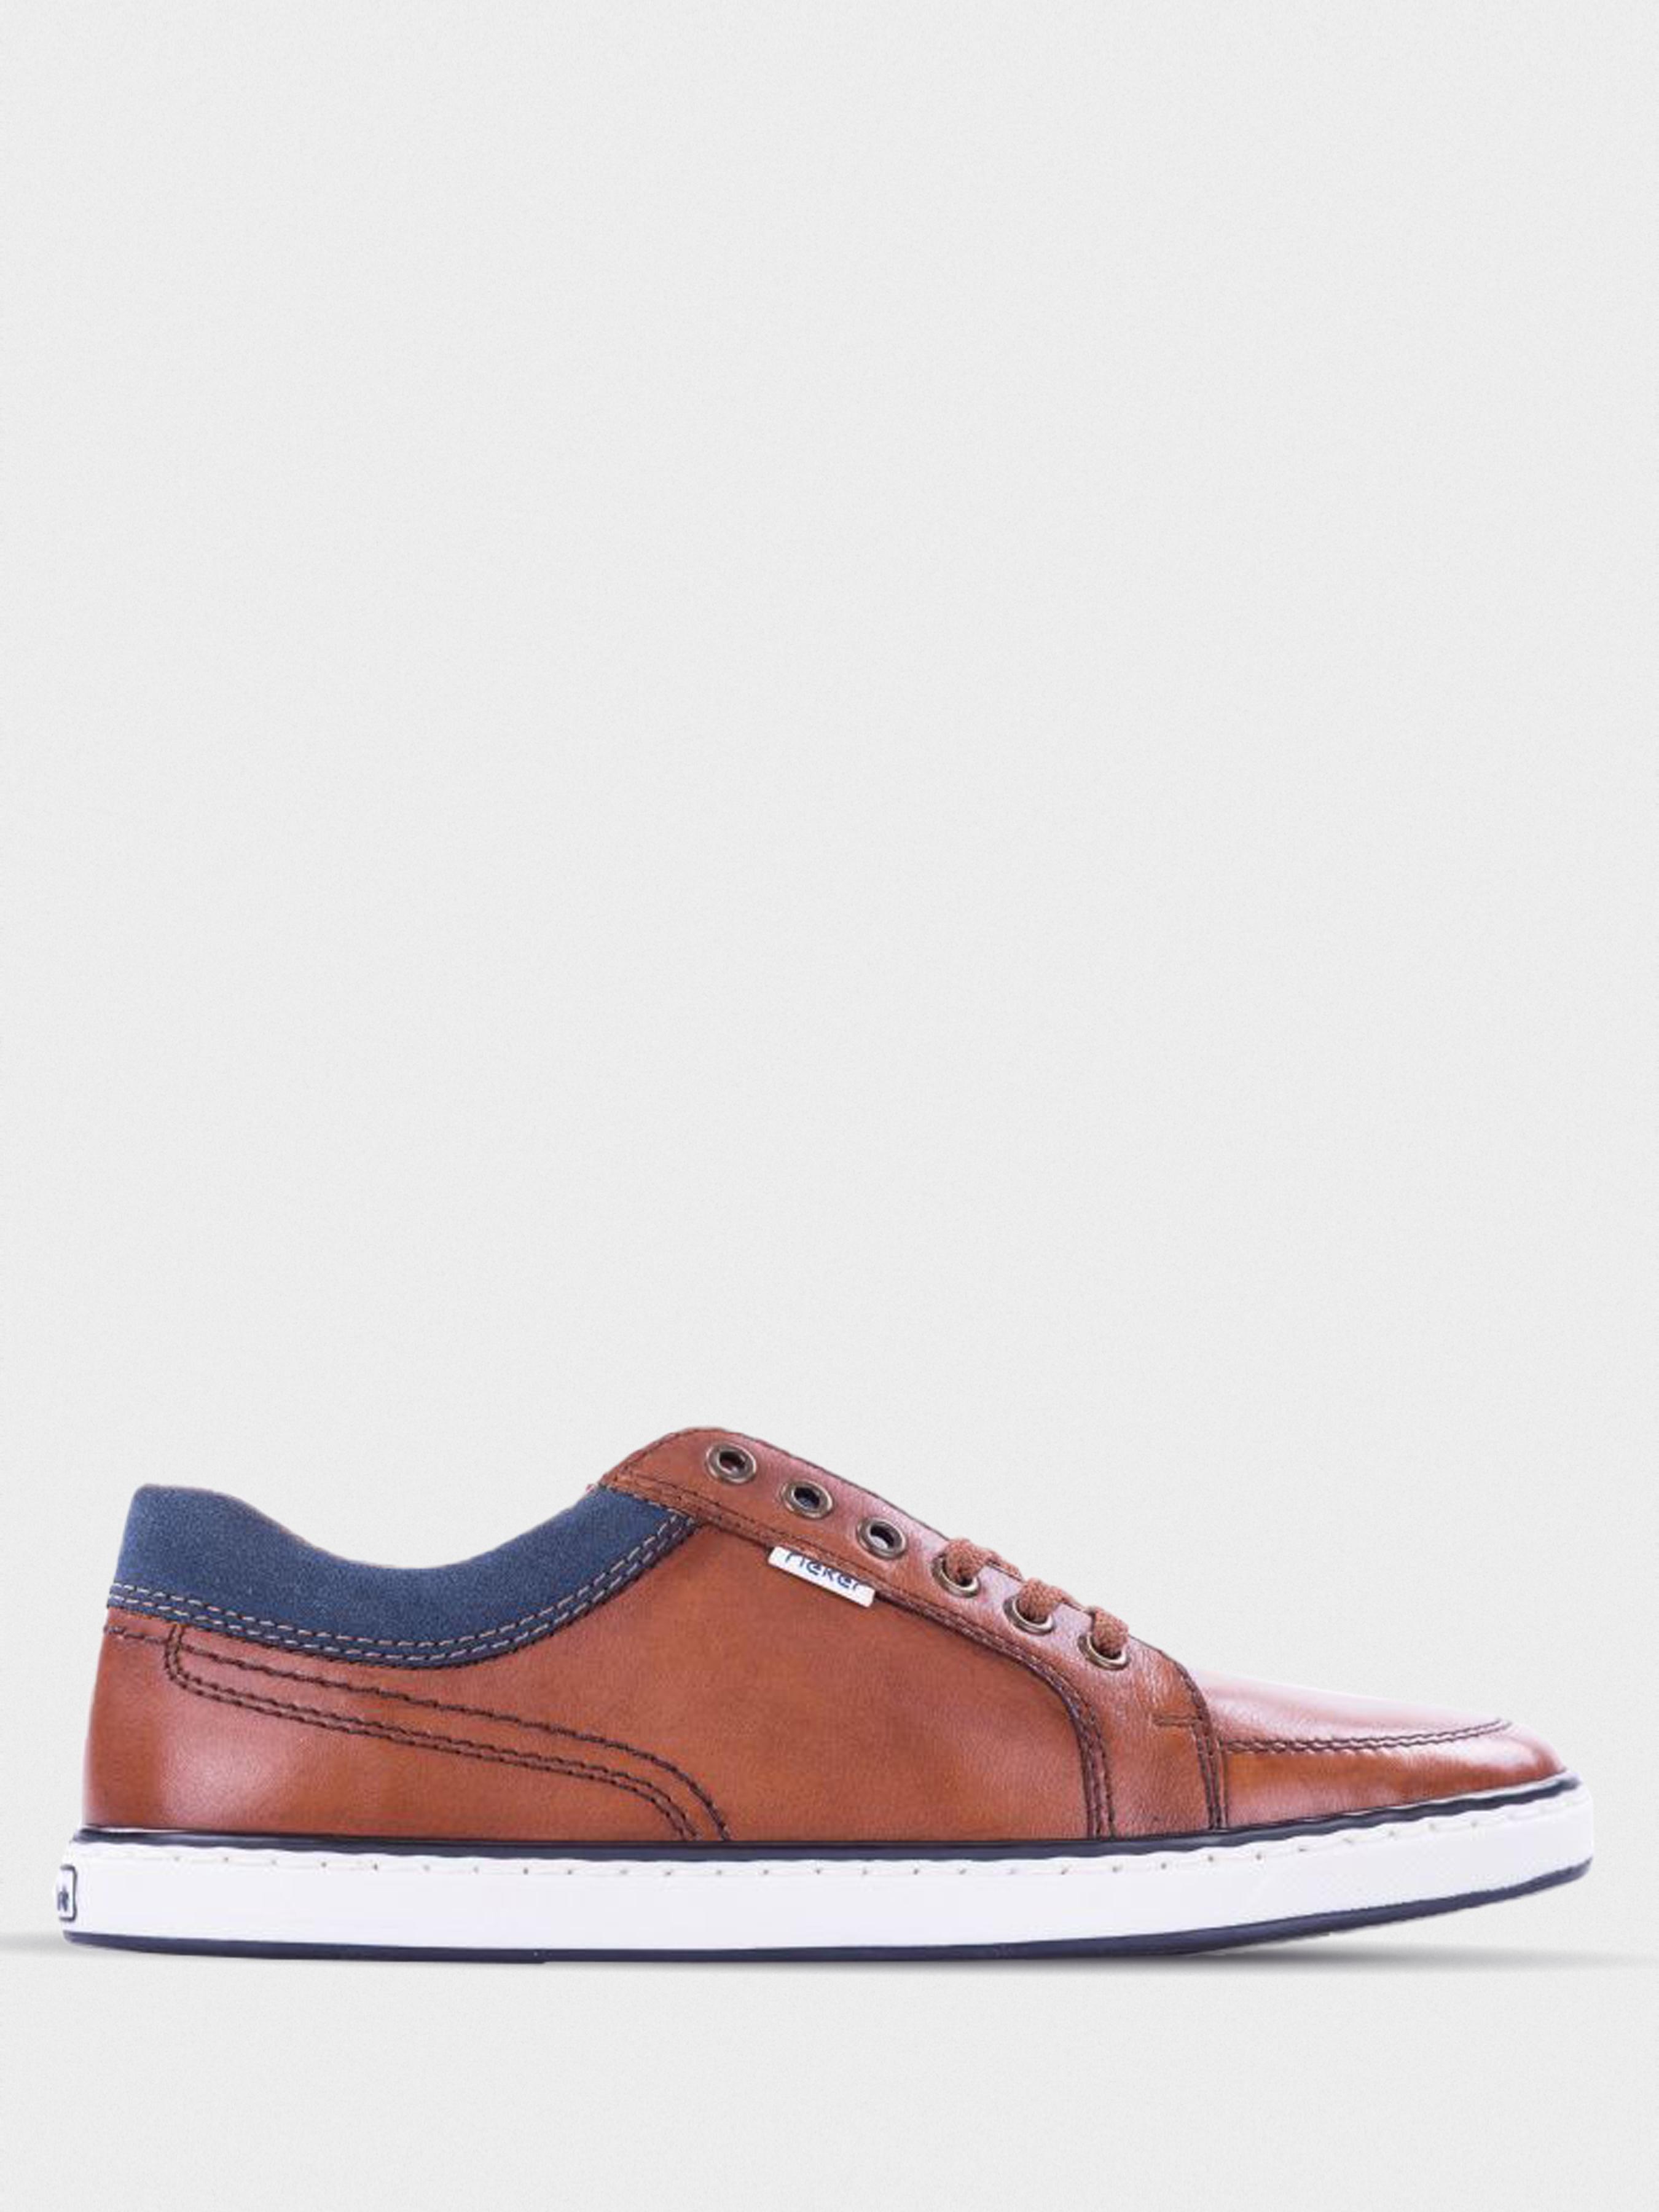 Полуботинки для мужчин RIEKER RK590 размеры обуви, 2017